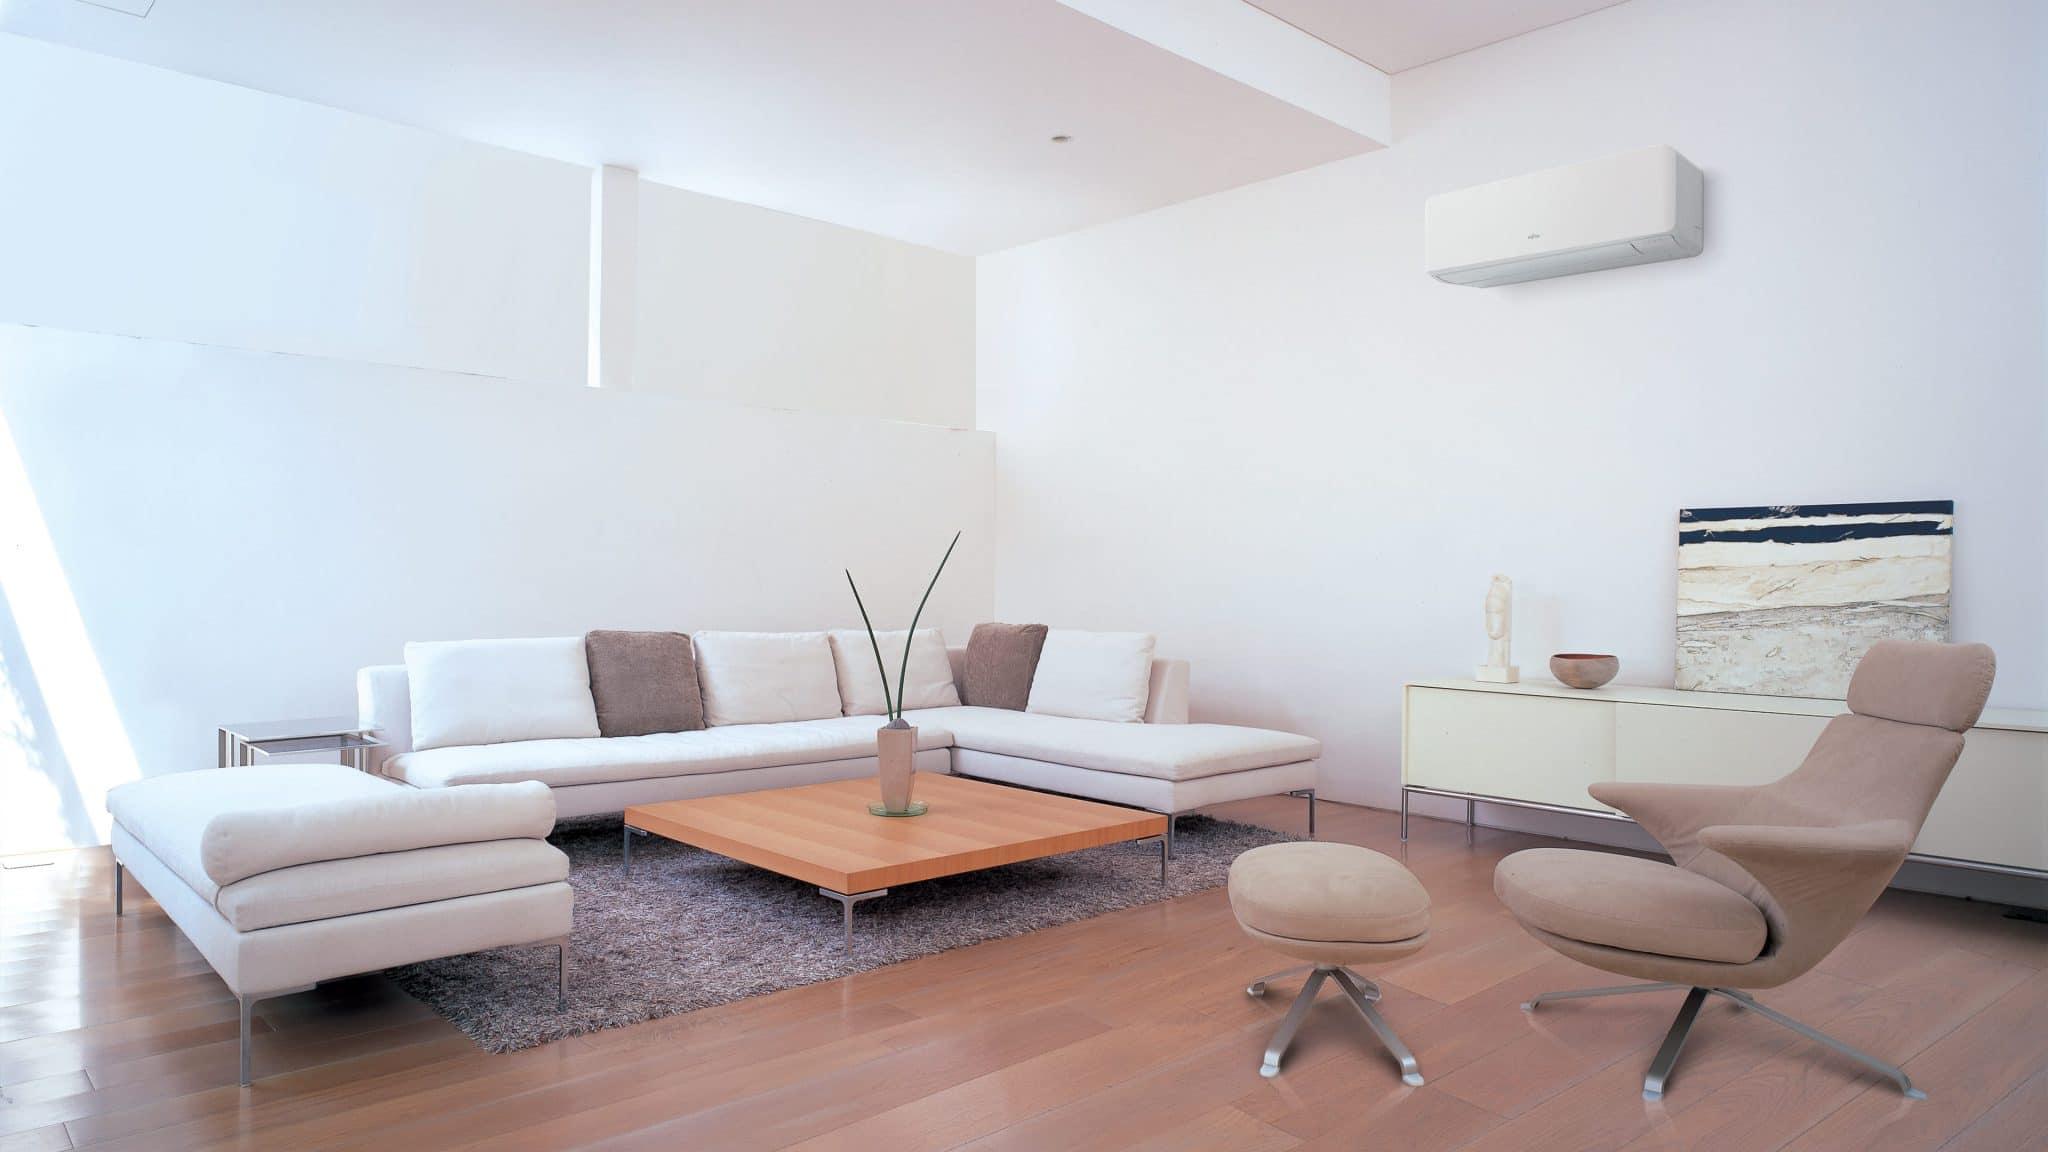 Green House Solutions zonnepanelen batterijopslag laadpalen airconditioning fujitsu 000004